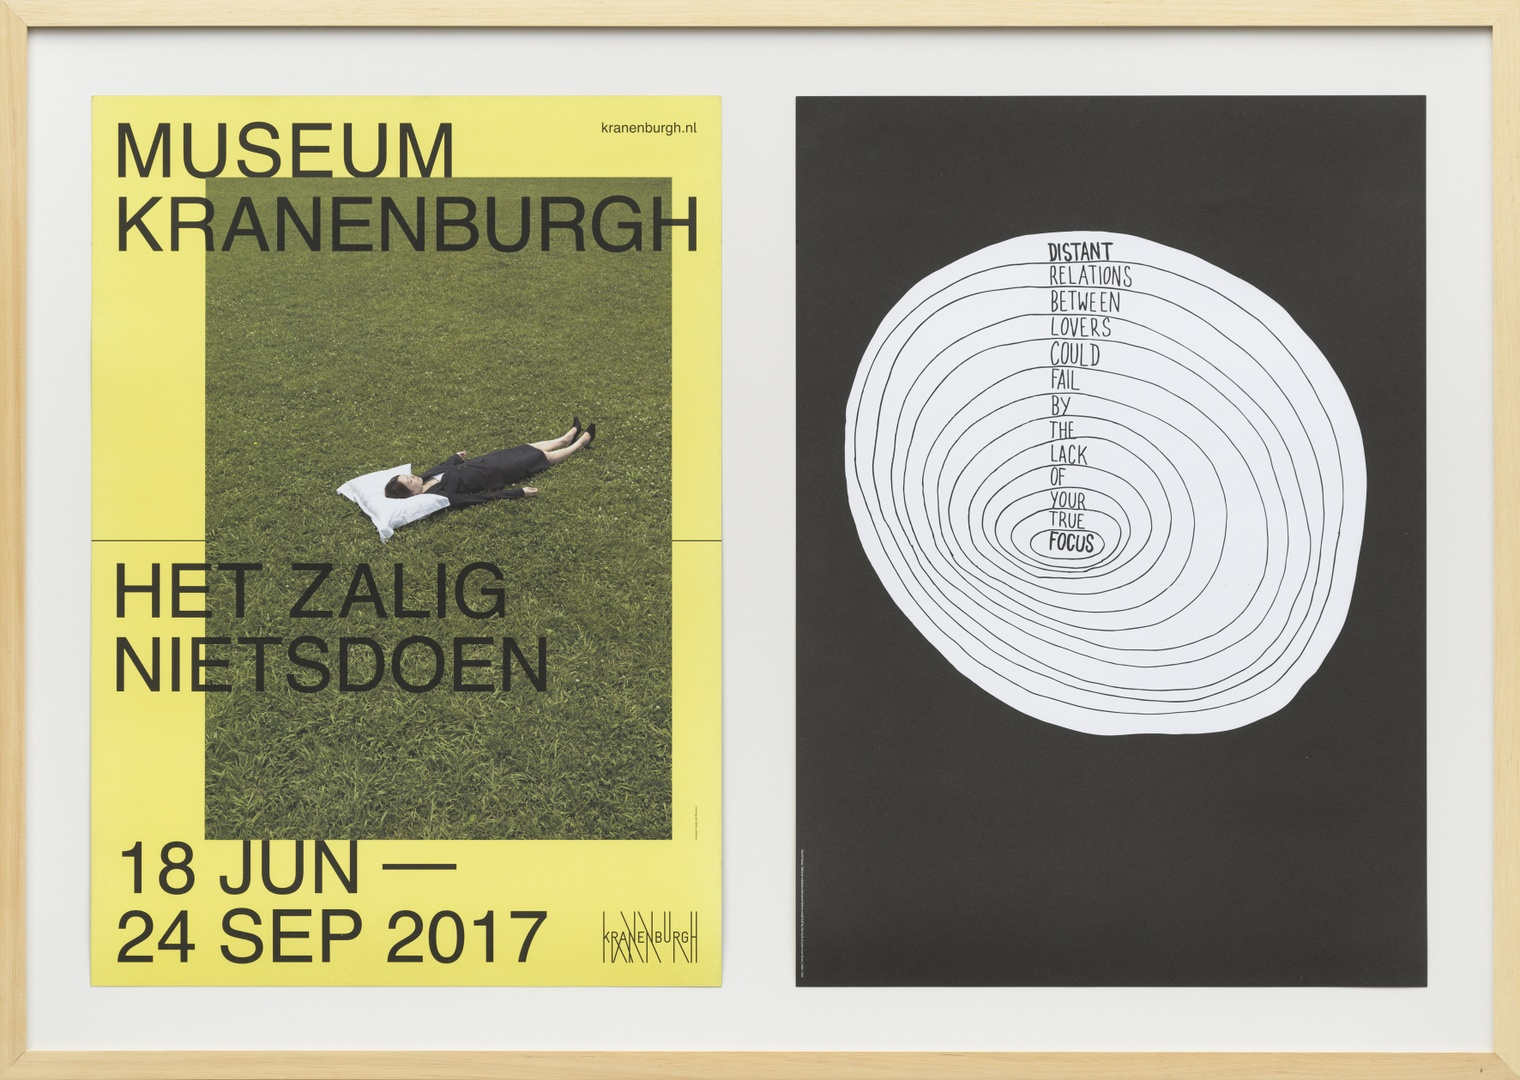 'Untitled' (Distant relations between lovers could fail by the lack of your true focus) : tentoonstellingsposter Het zalig nietsdoen, Museum Kranenburgh, 18 juni - 24 september 2017